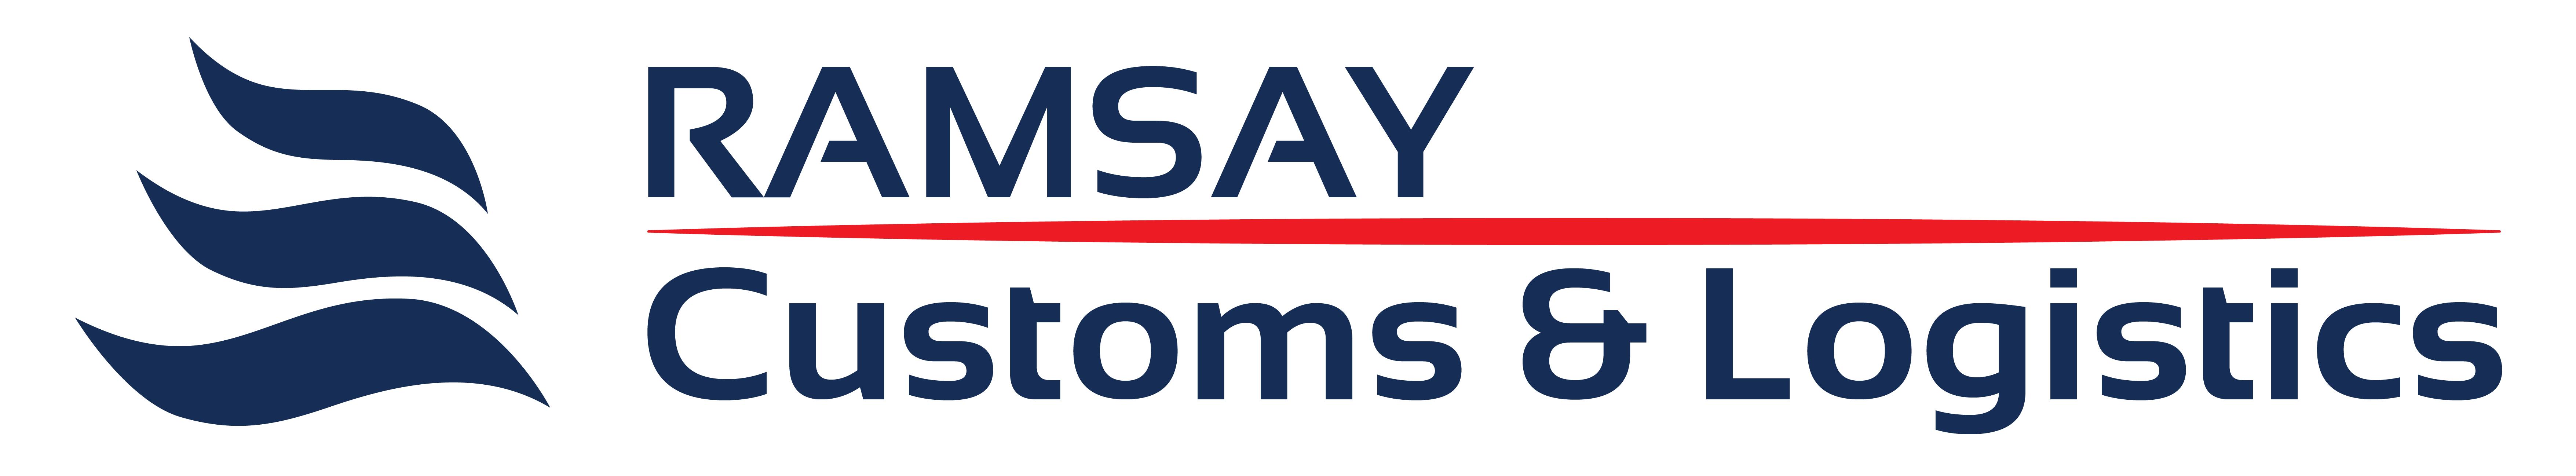 Ramsay Logistics Ltd.